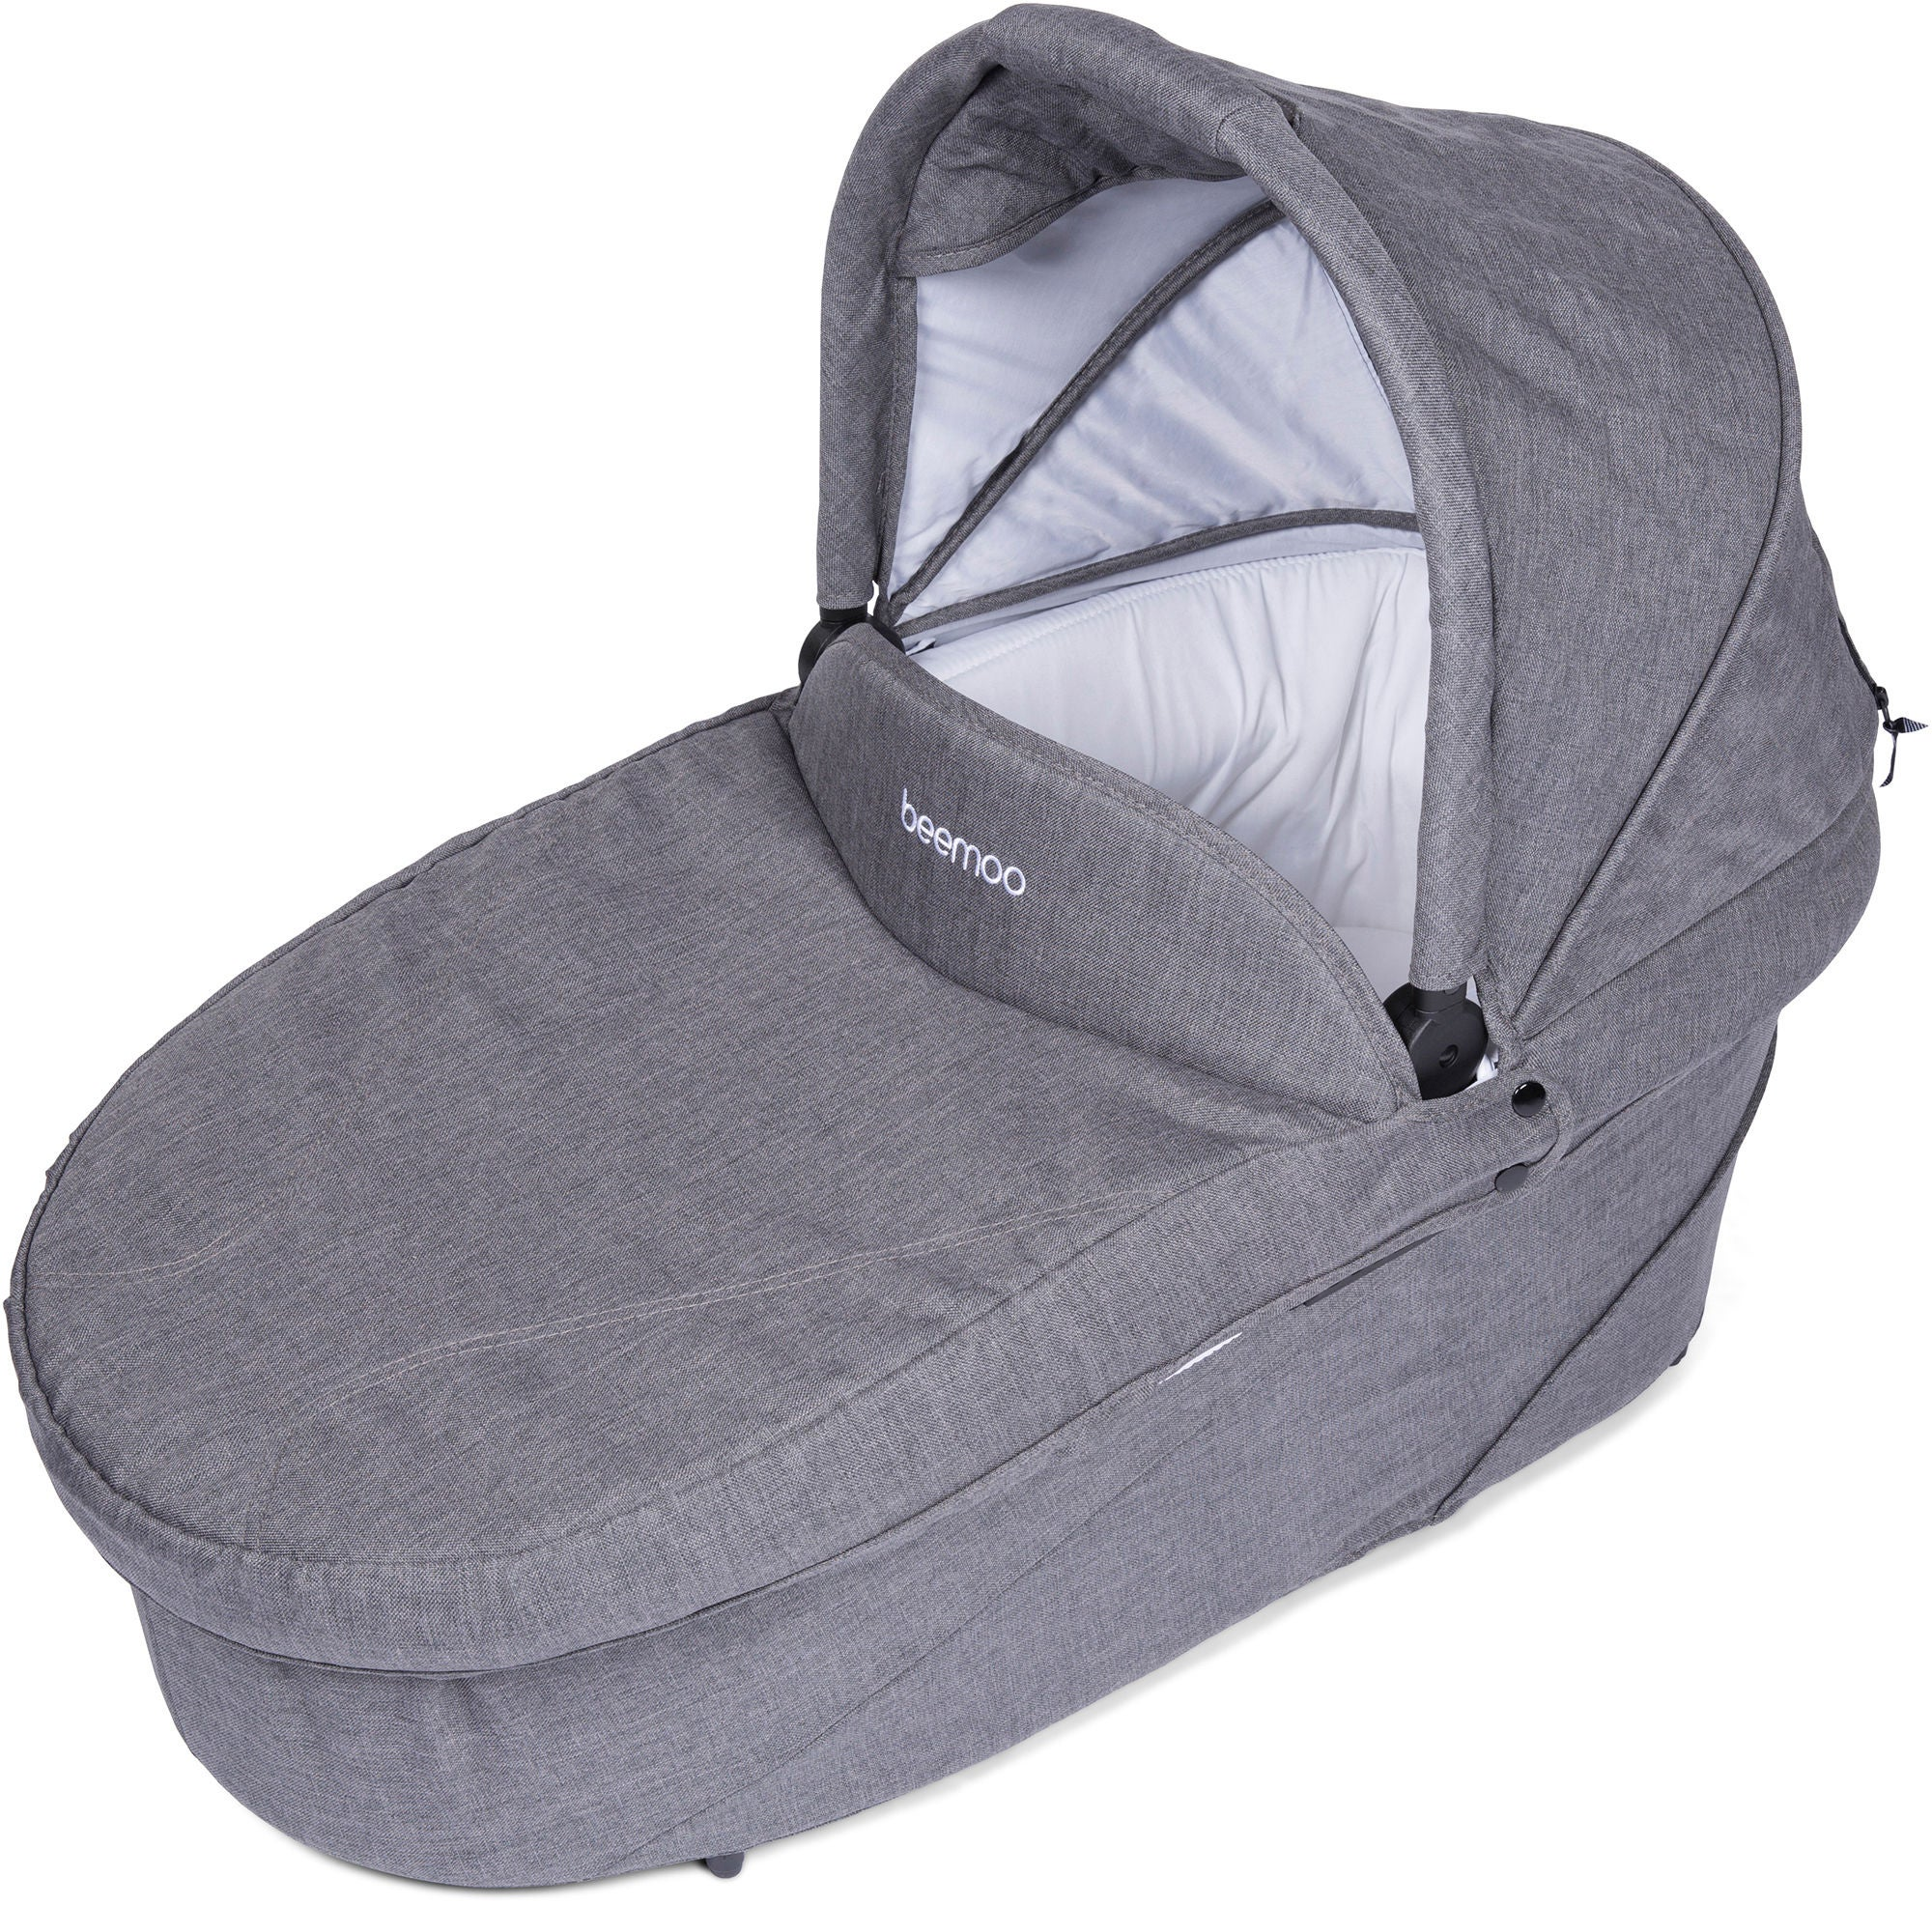 Beemoo Airfill Liggdel, Grey Melange